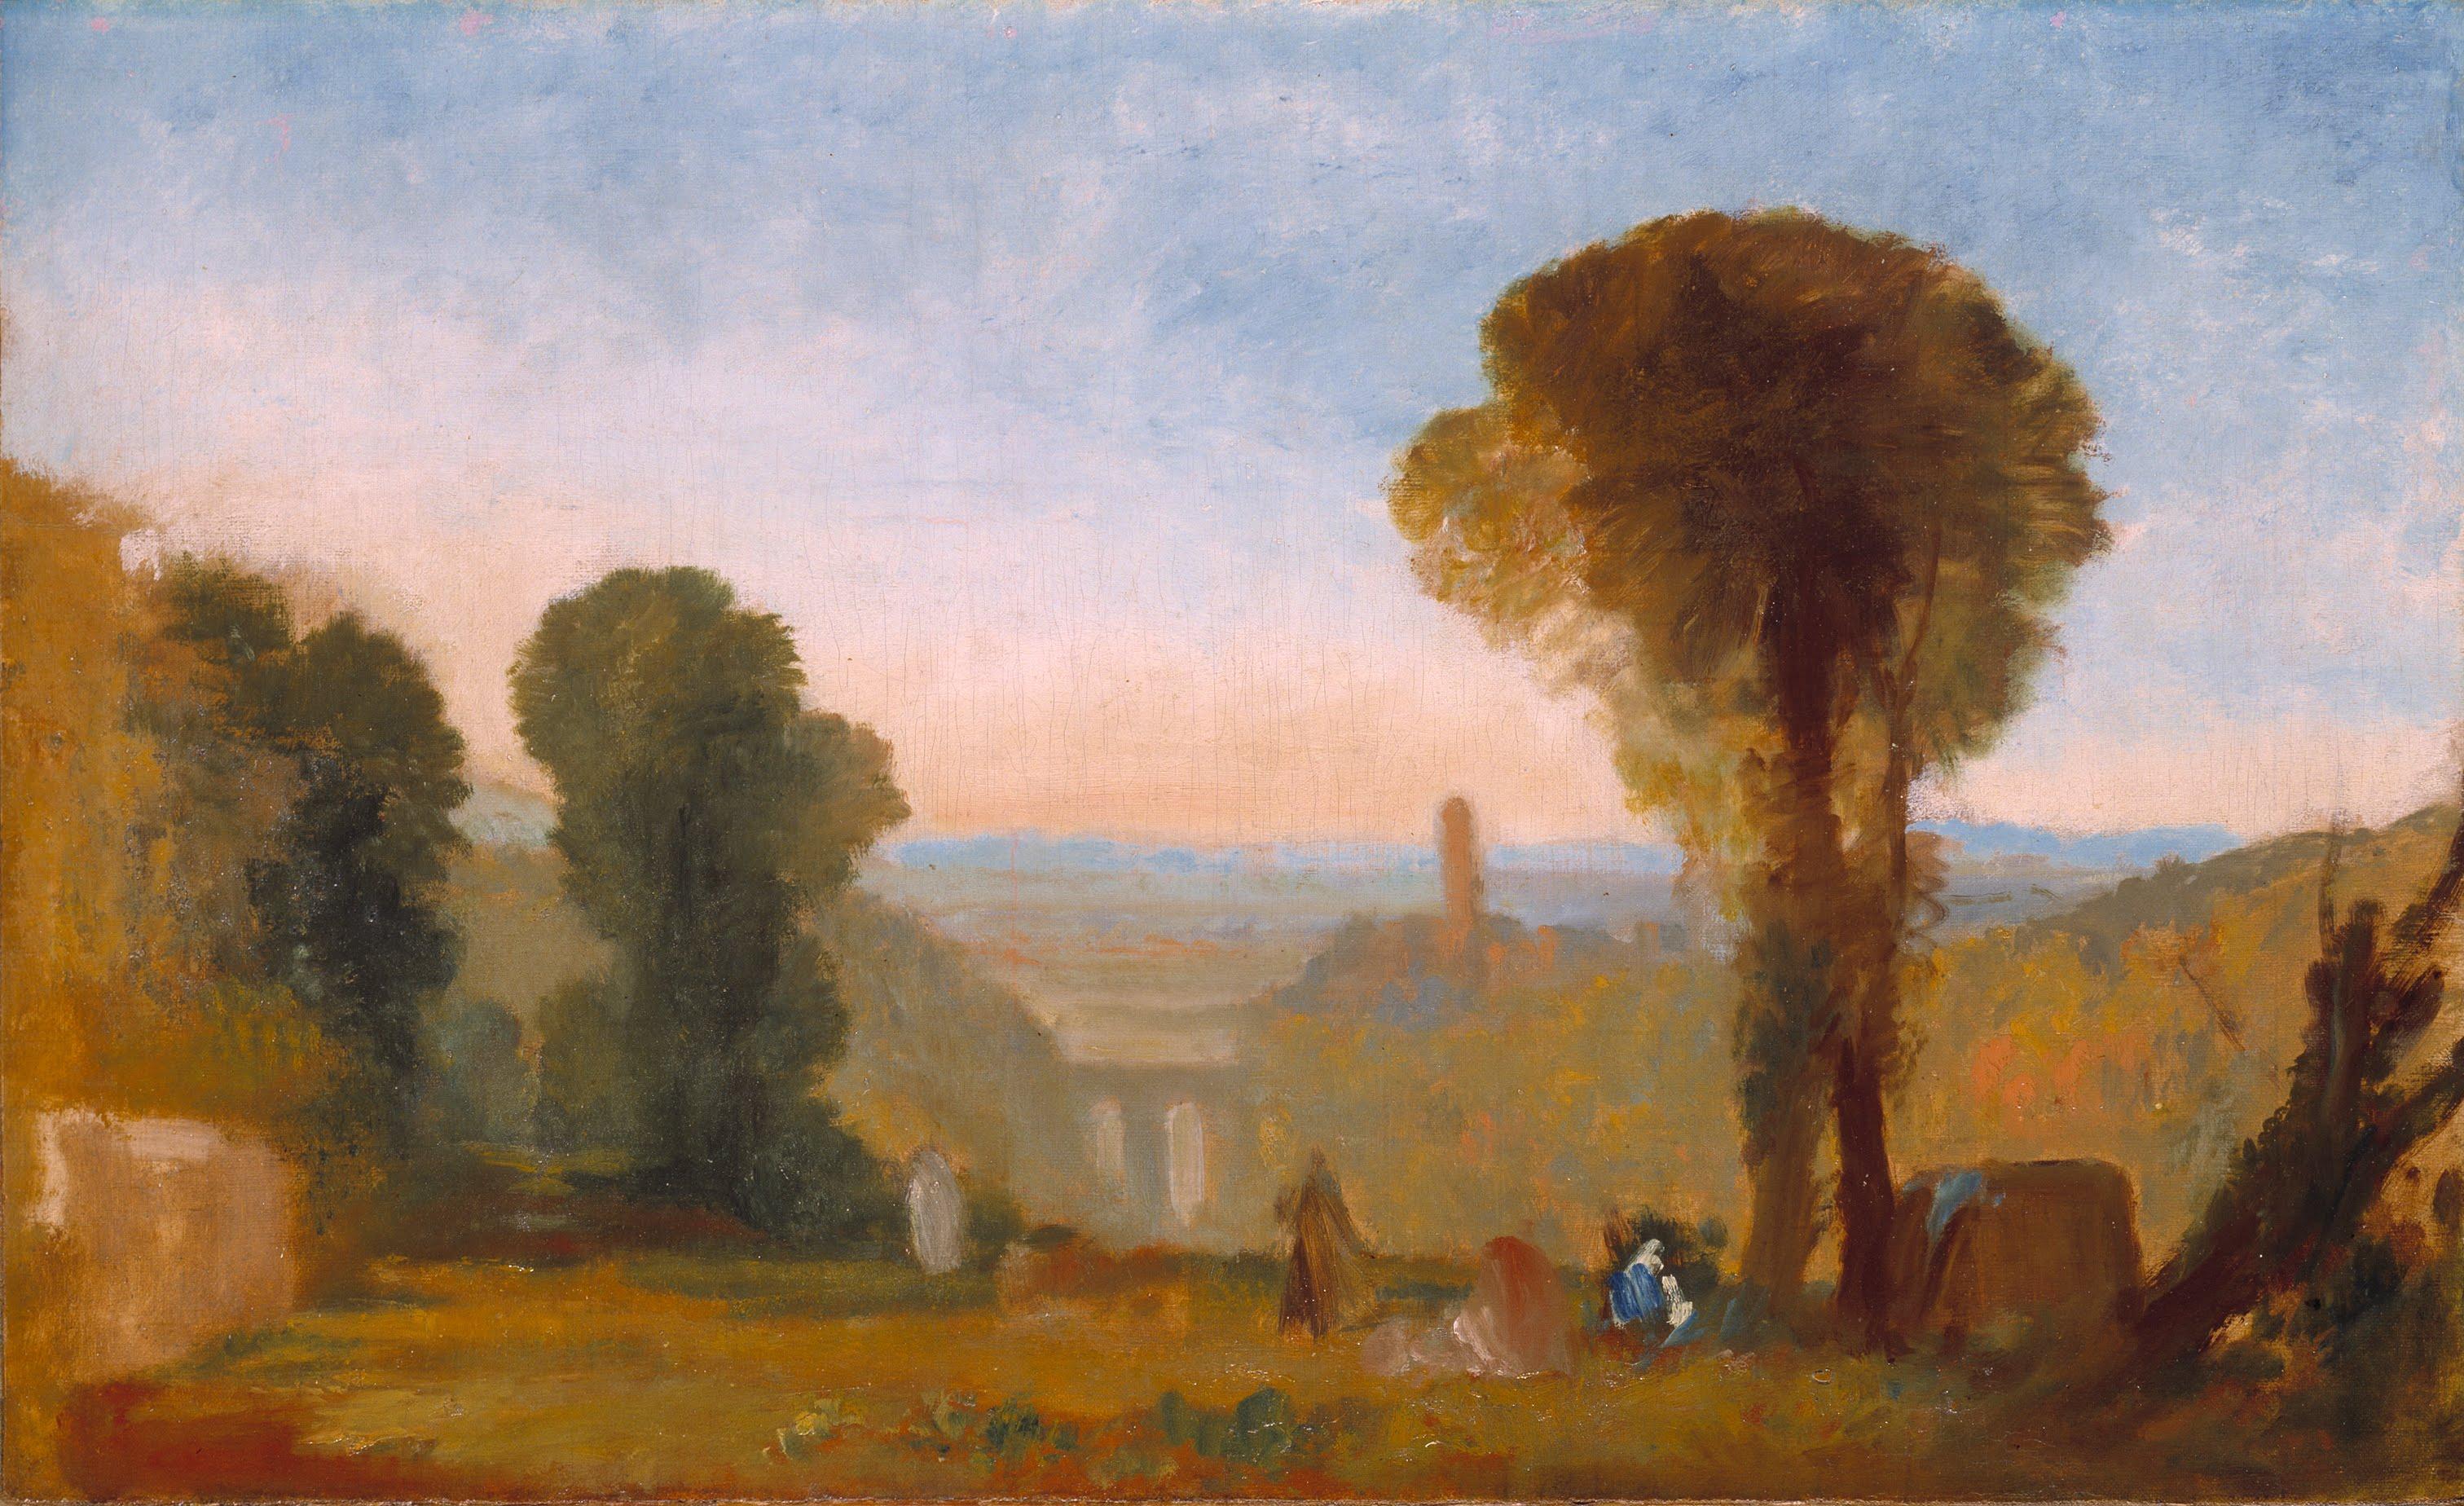 File:Joseph Mallord William Turner   Italian Landscape With Bridge And  Tower   Google Art